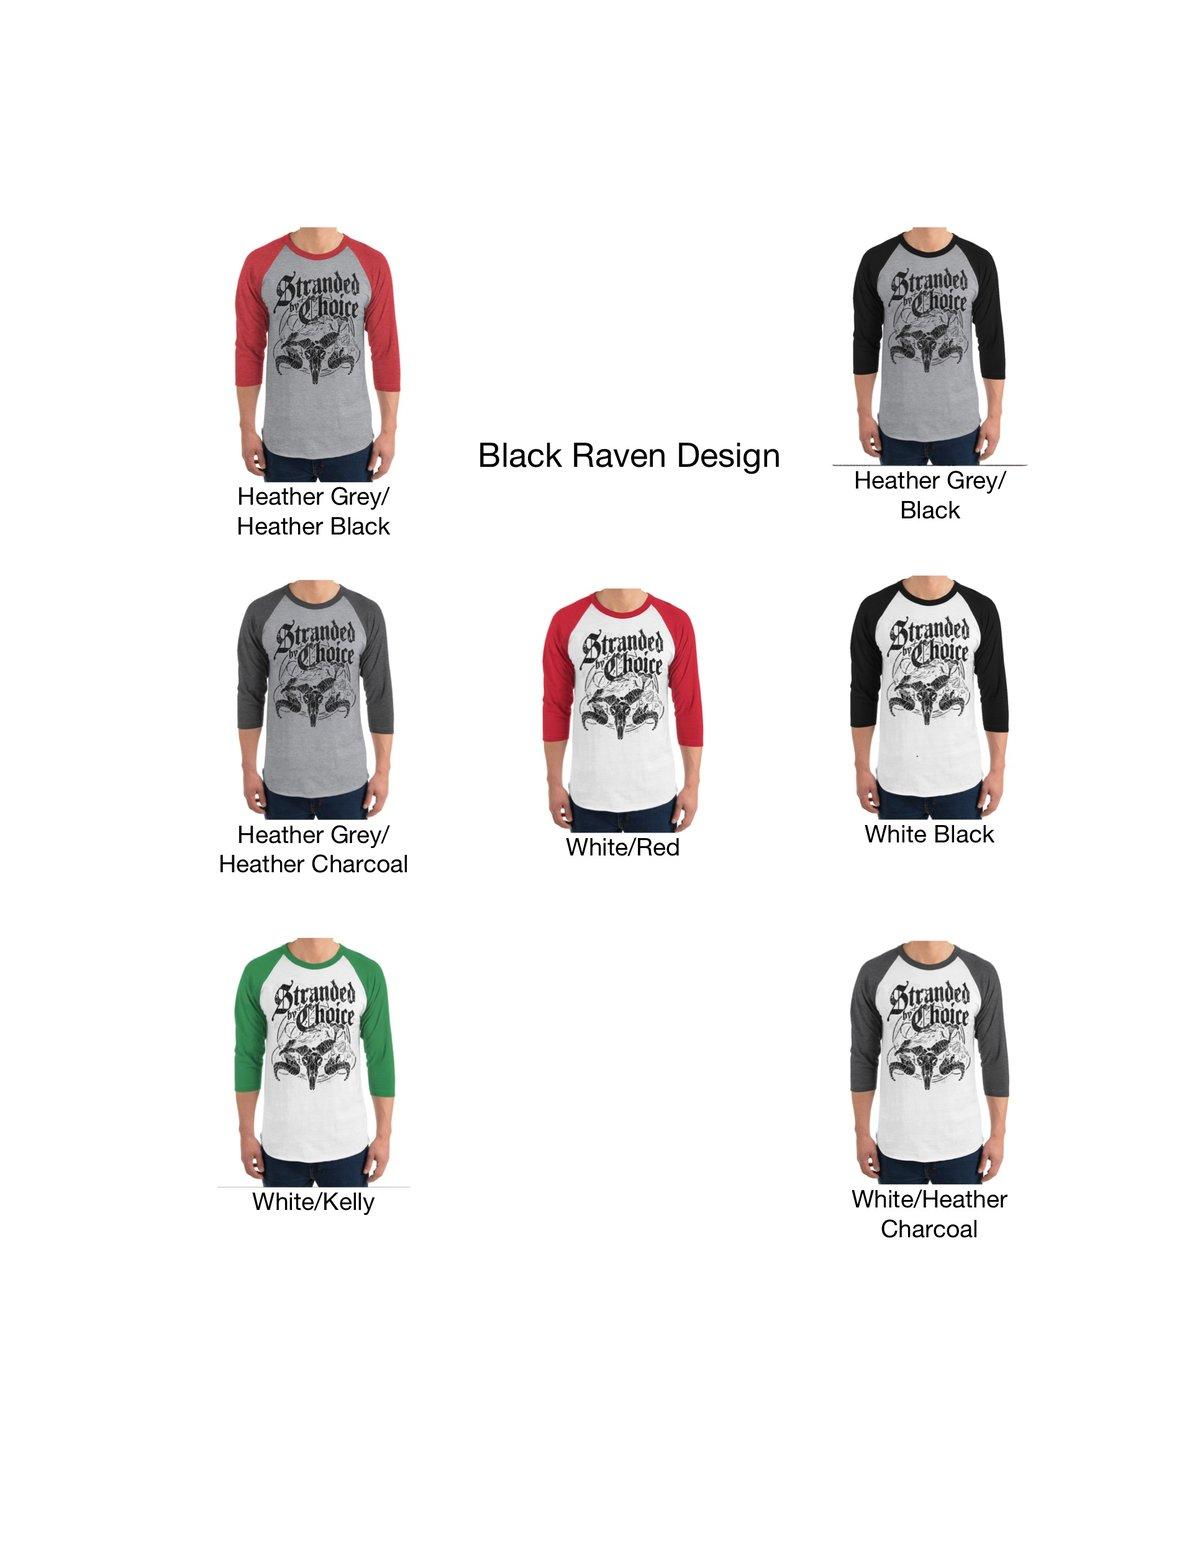 Raven Design 3/4 Sleeve Raglan Unisex Shirt